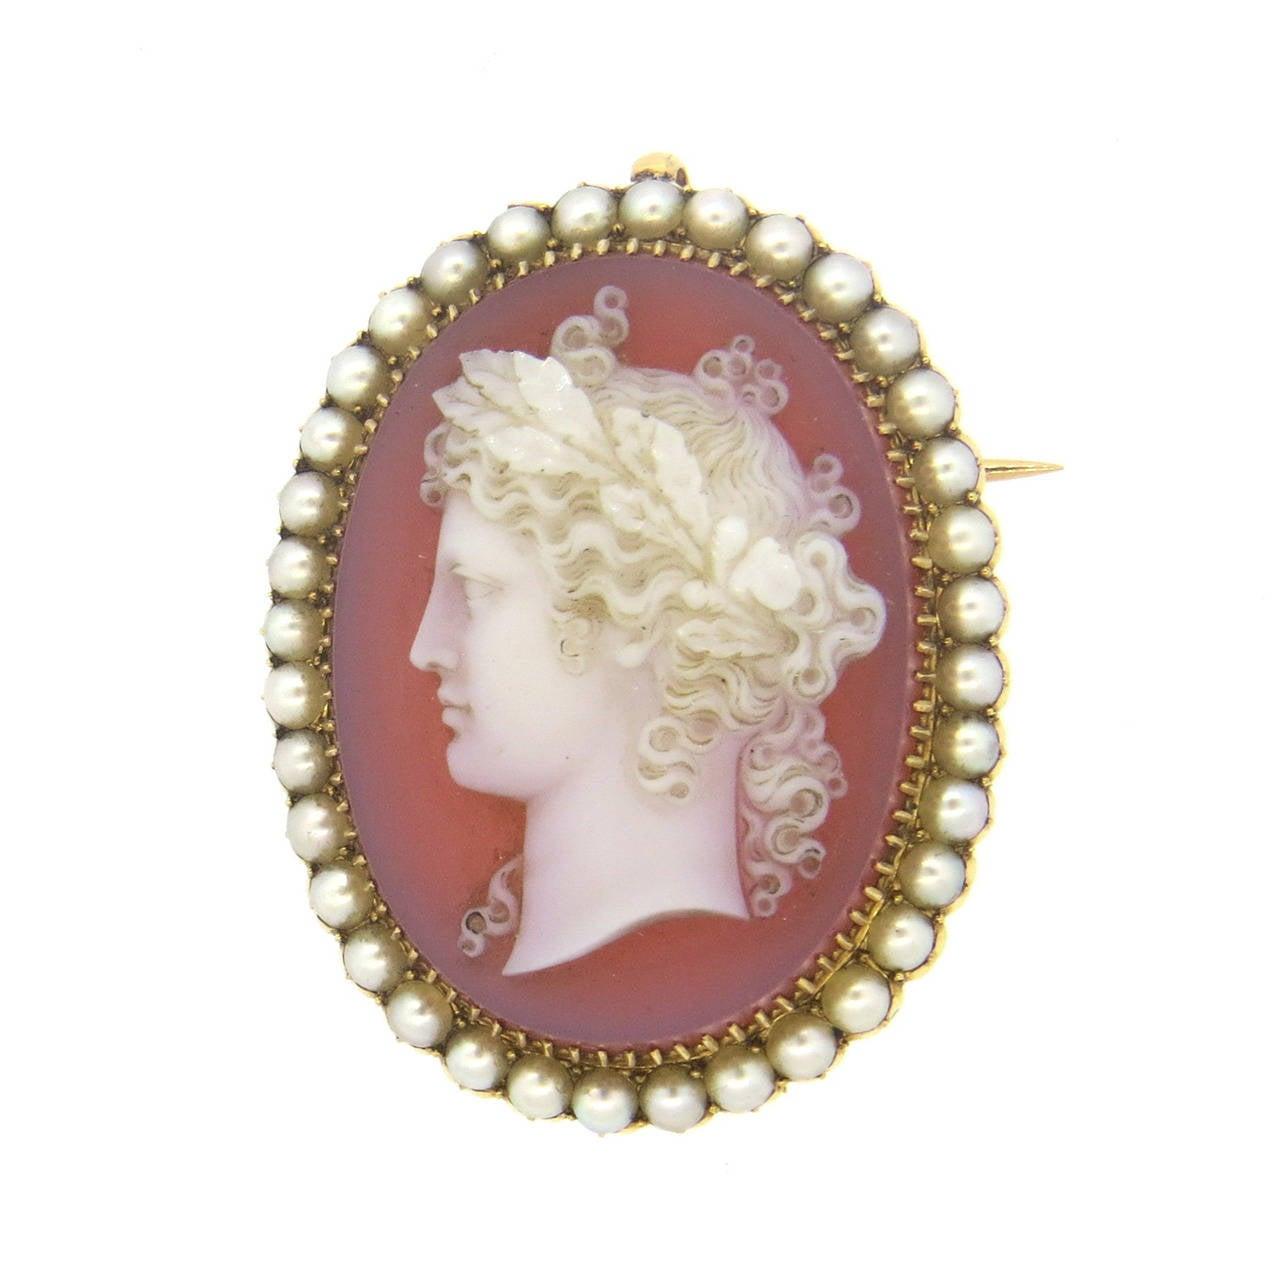 impressive antique pearl cameo brooch pendant